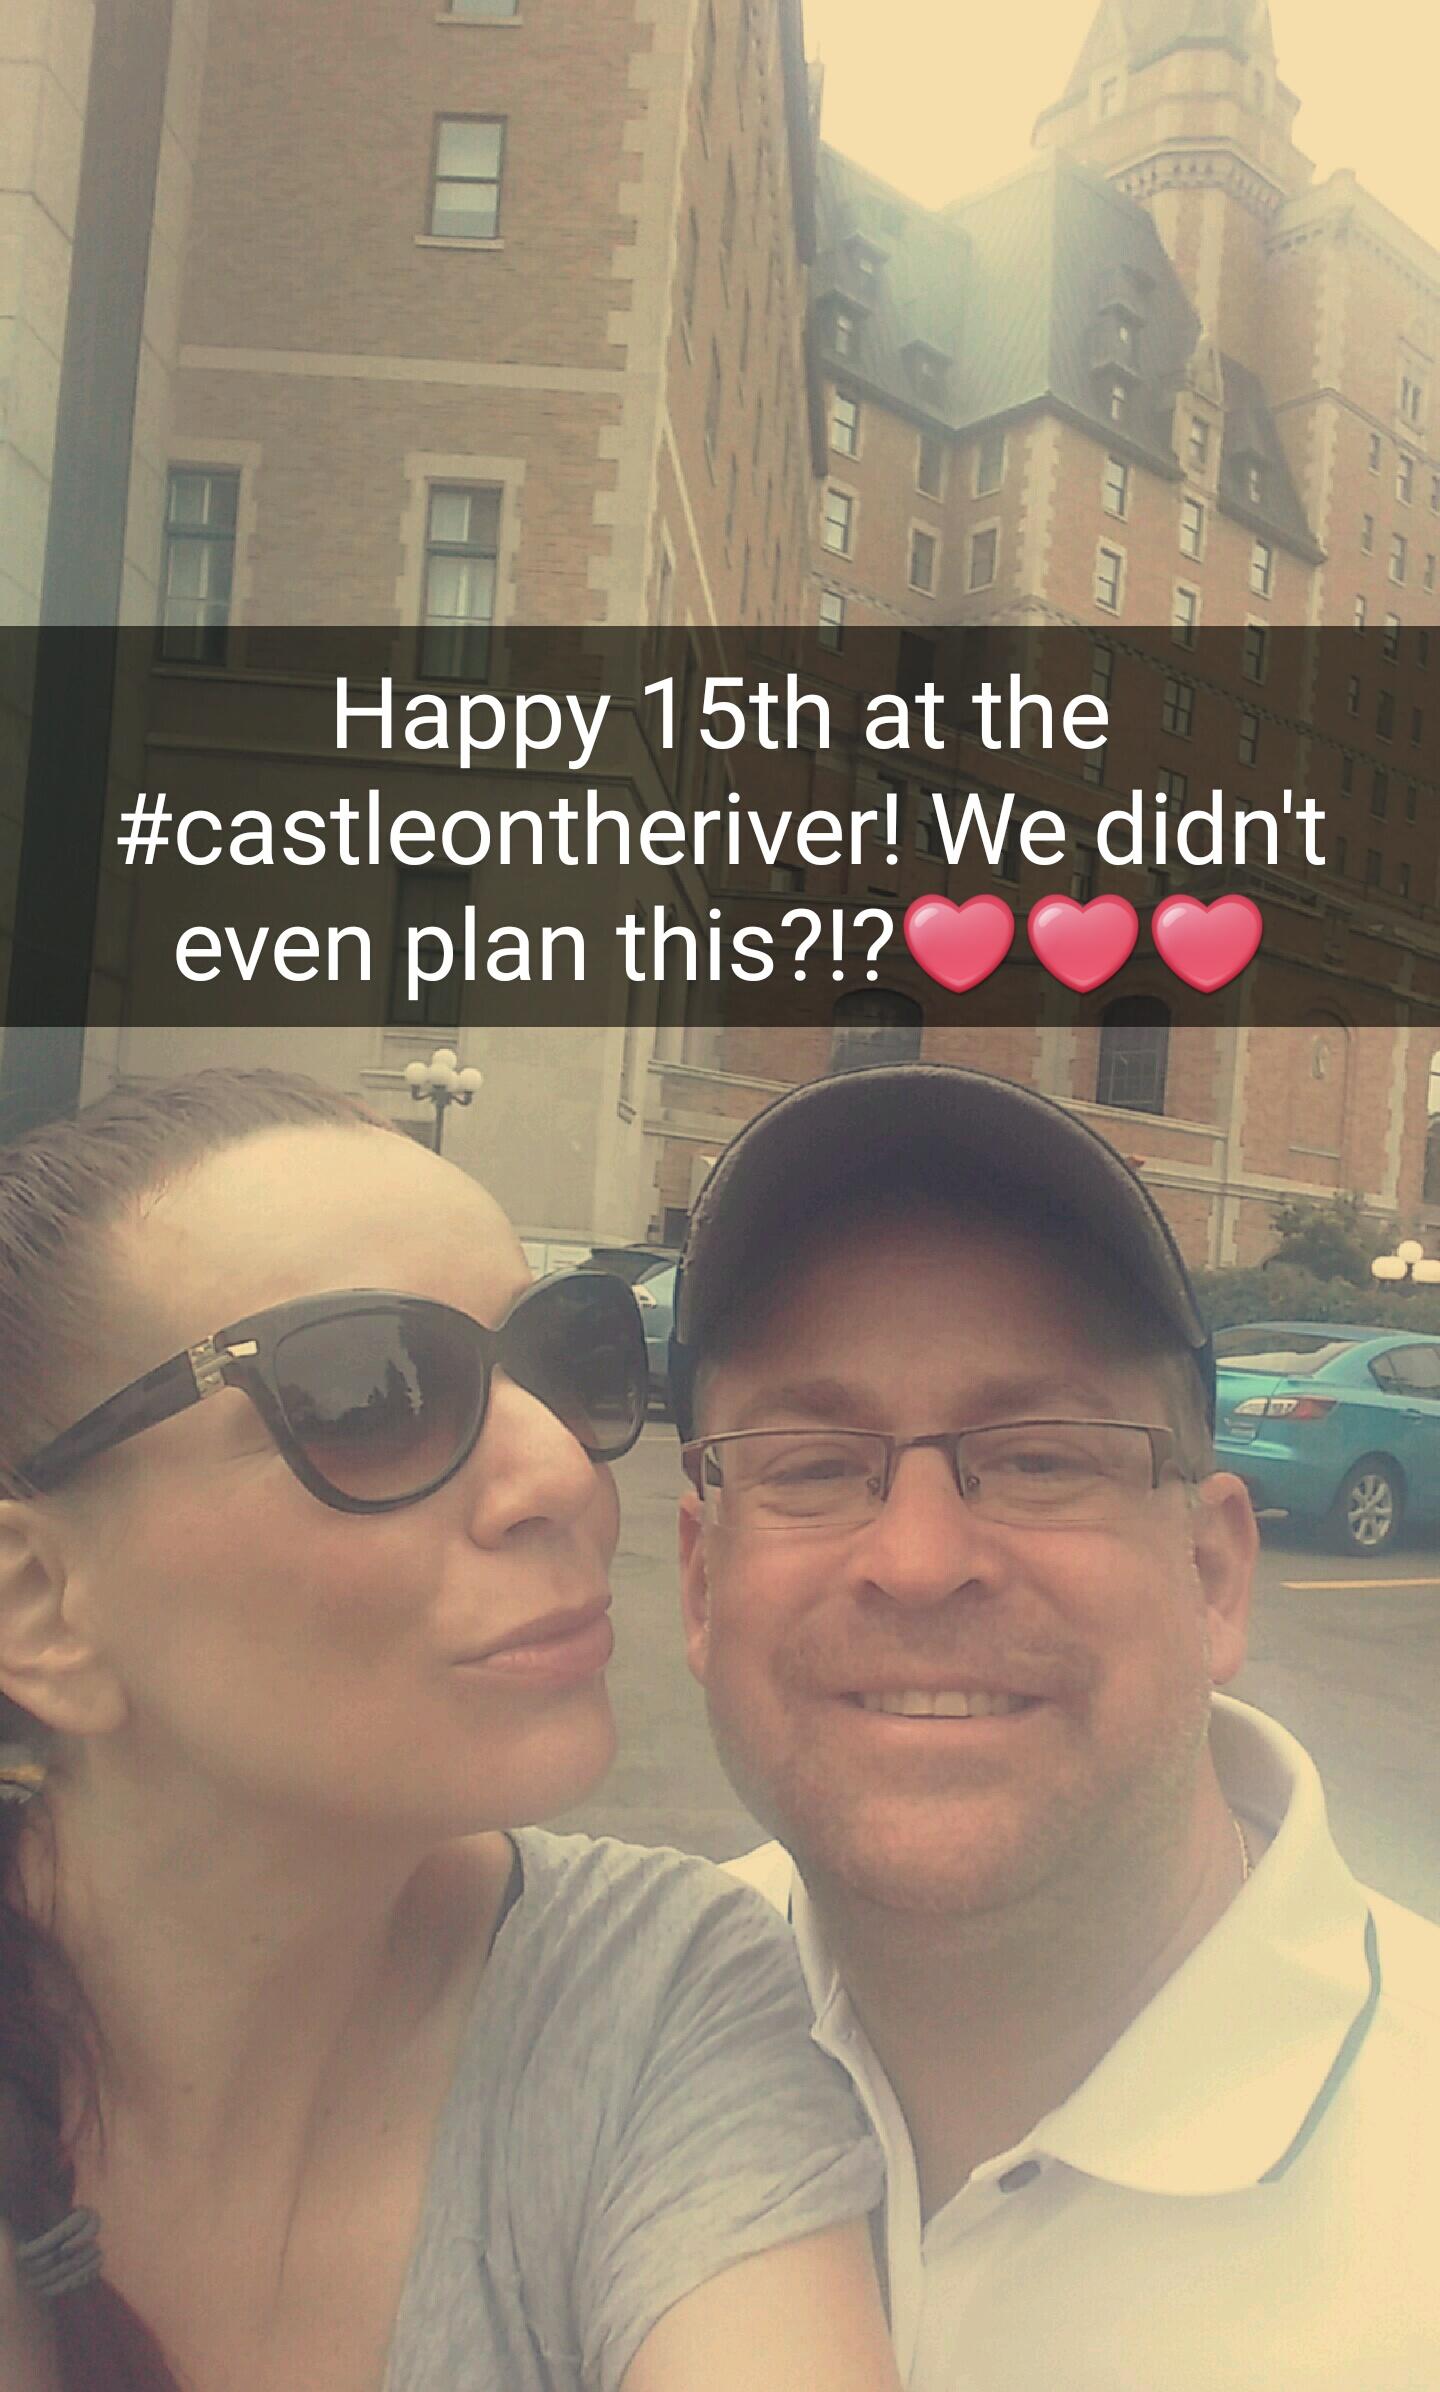 @mrsshannonmckenney's snapchat picture for deltabess